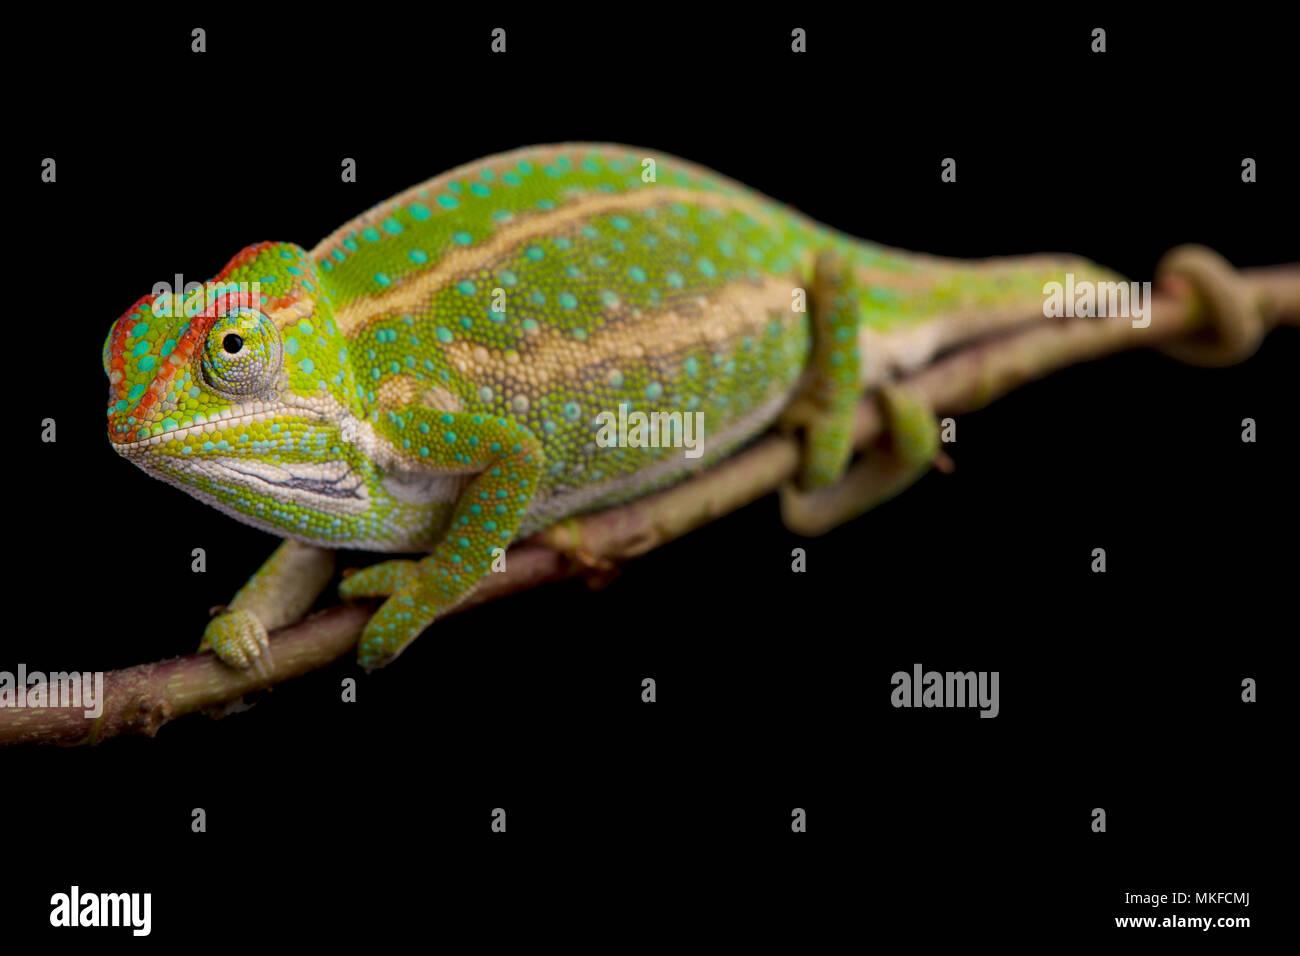 Jeweled Chameleon (Furcifer campani) auf schwarzem Hintergrund Stockbild